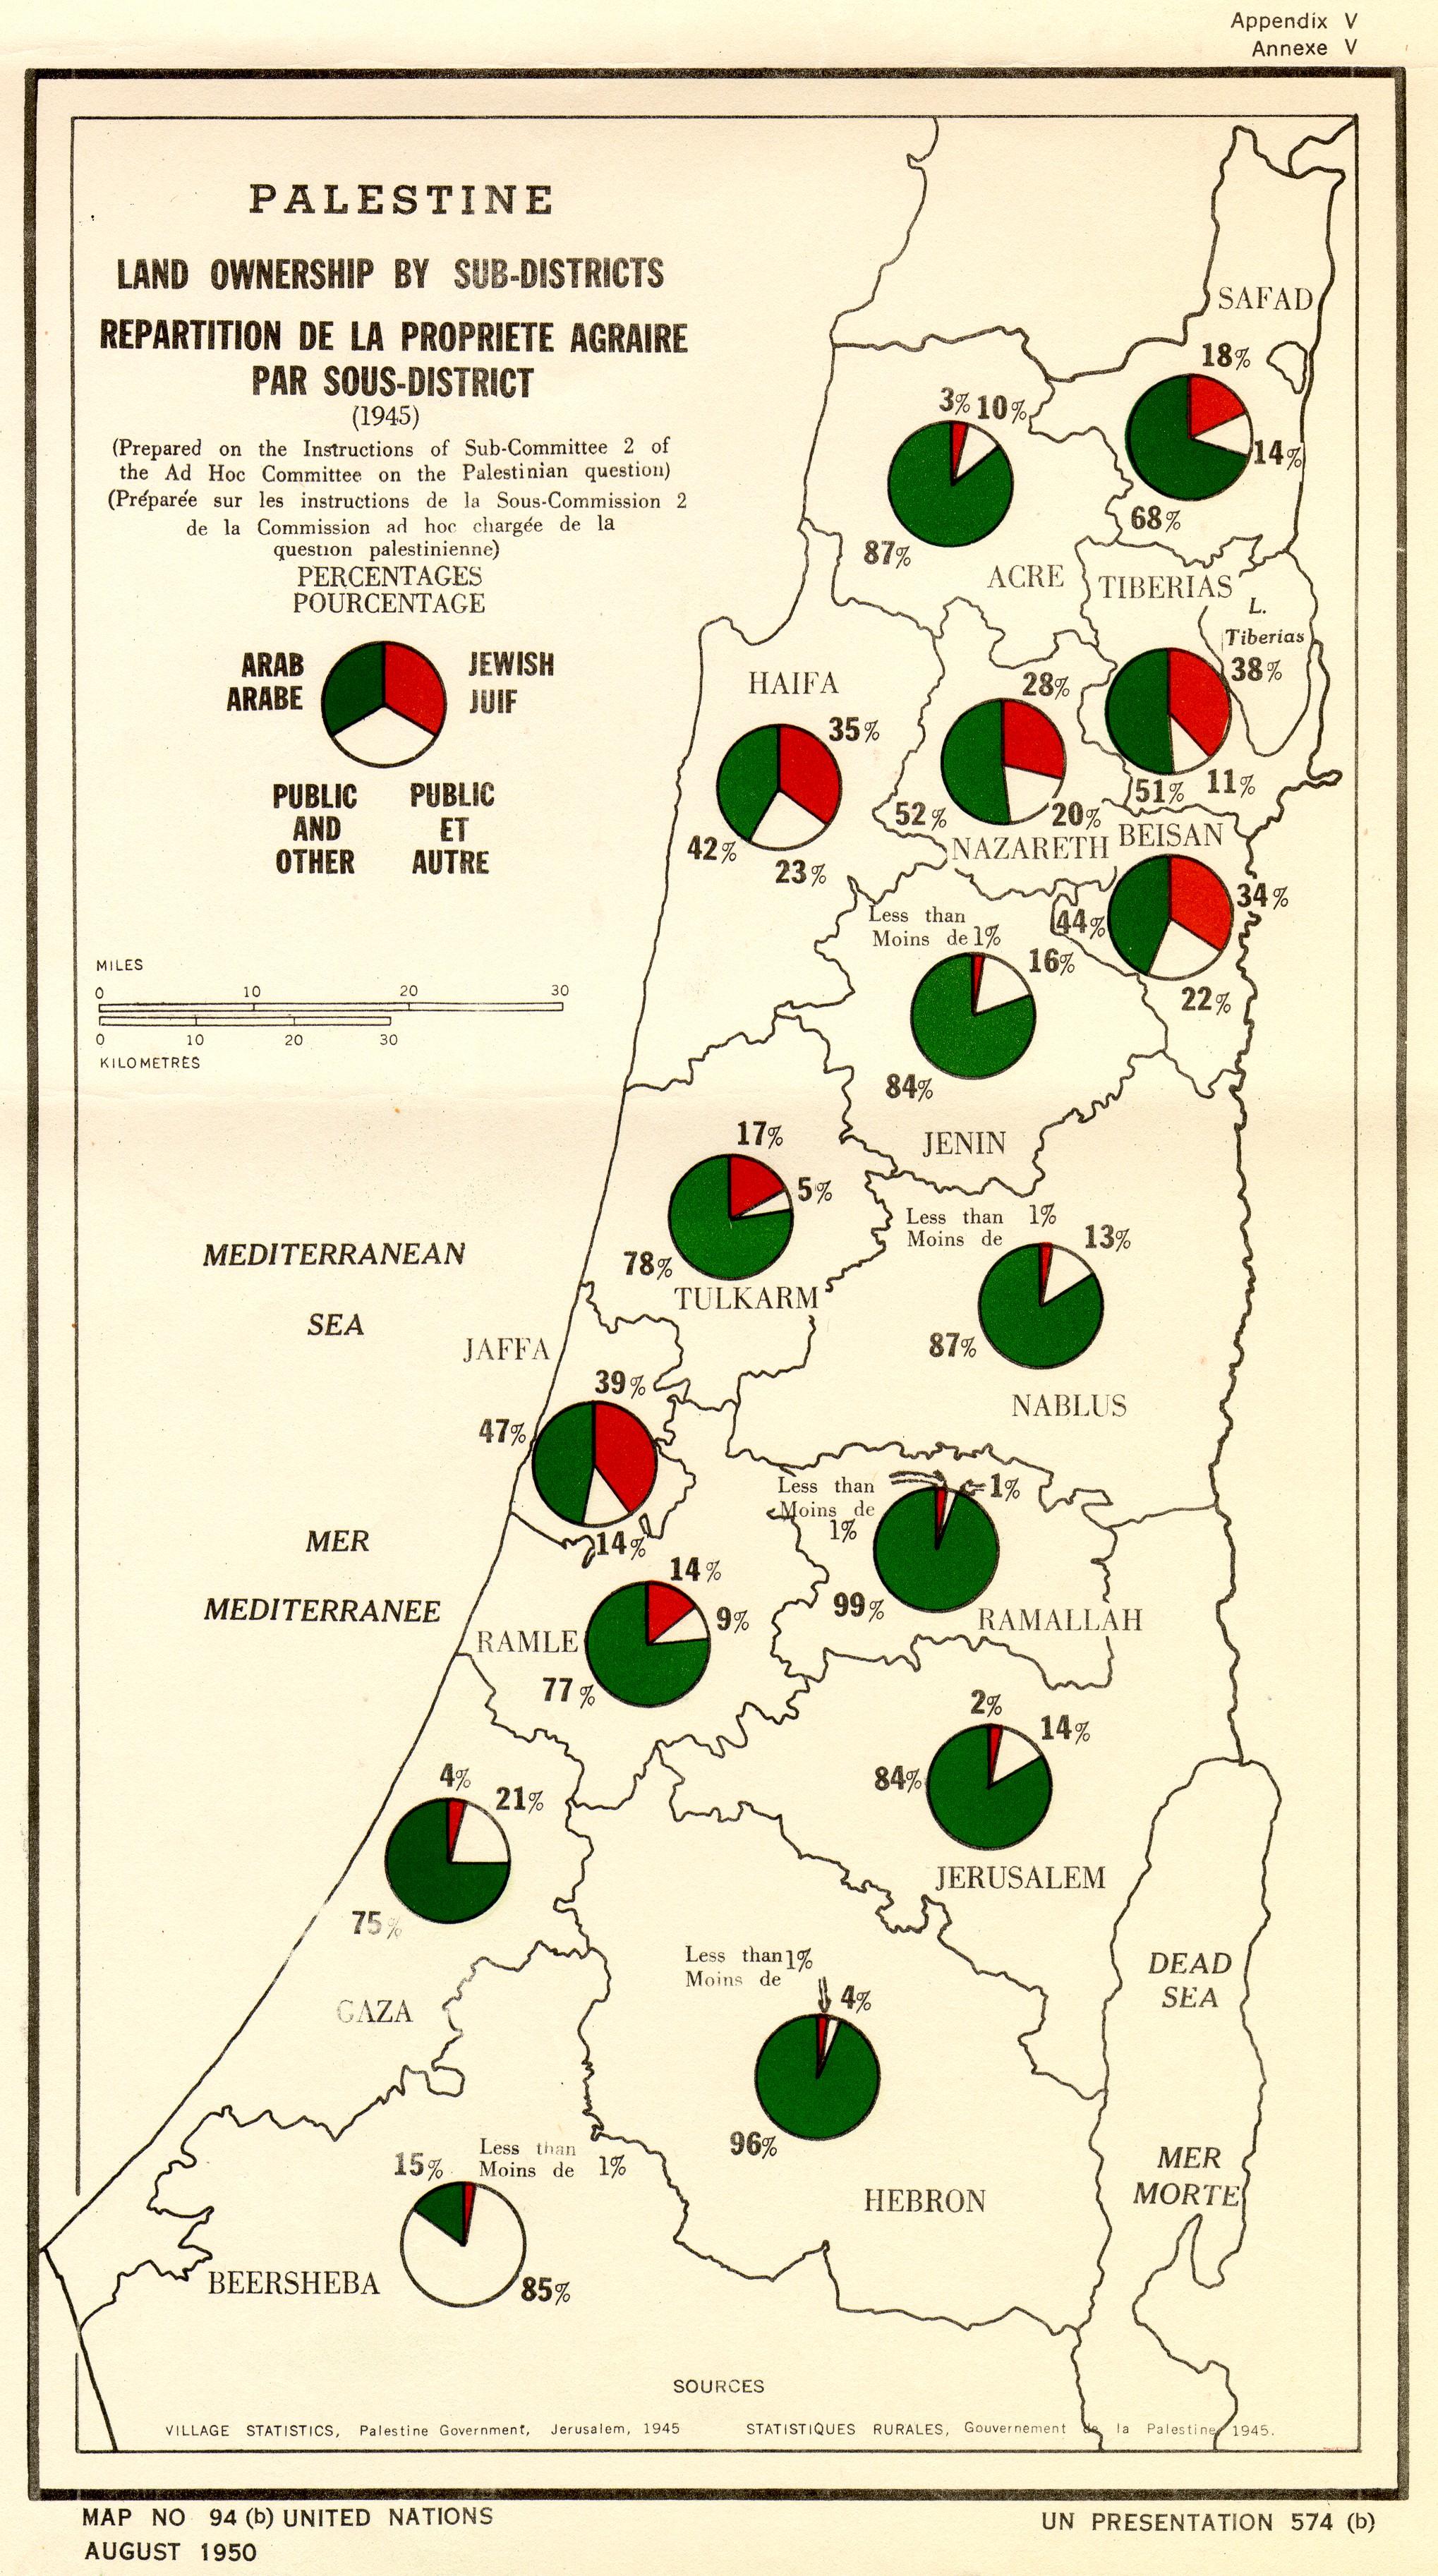 [Image: Palestine_Land_ownership_by_sub-district_%281945%29.jpg]